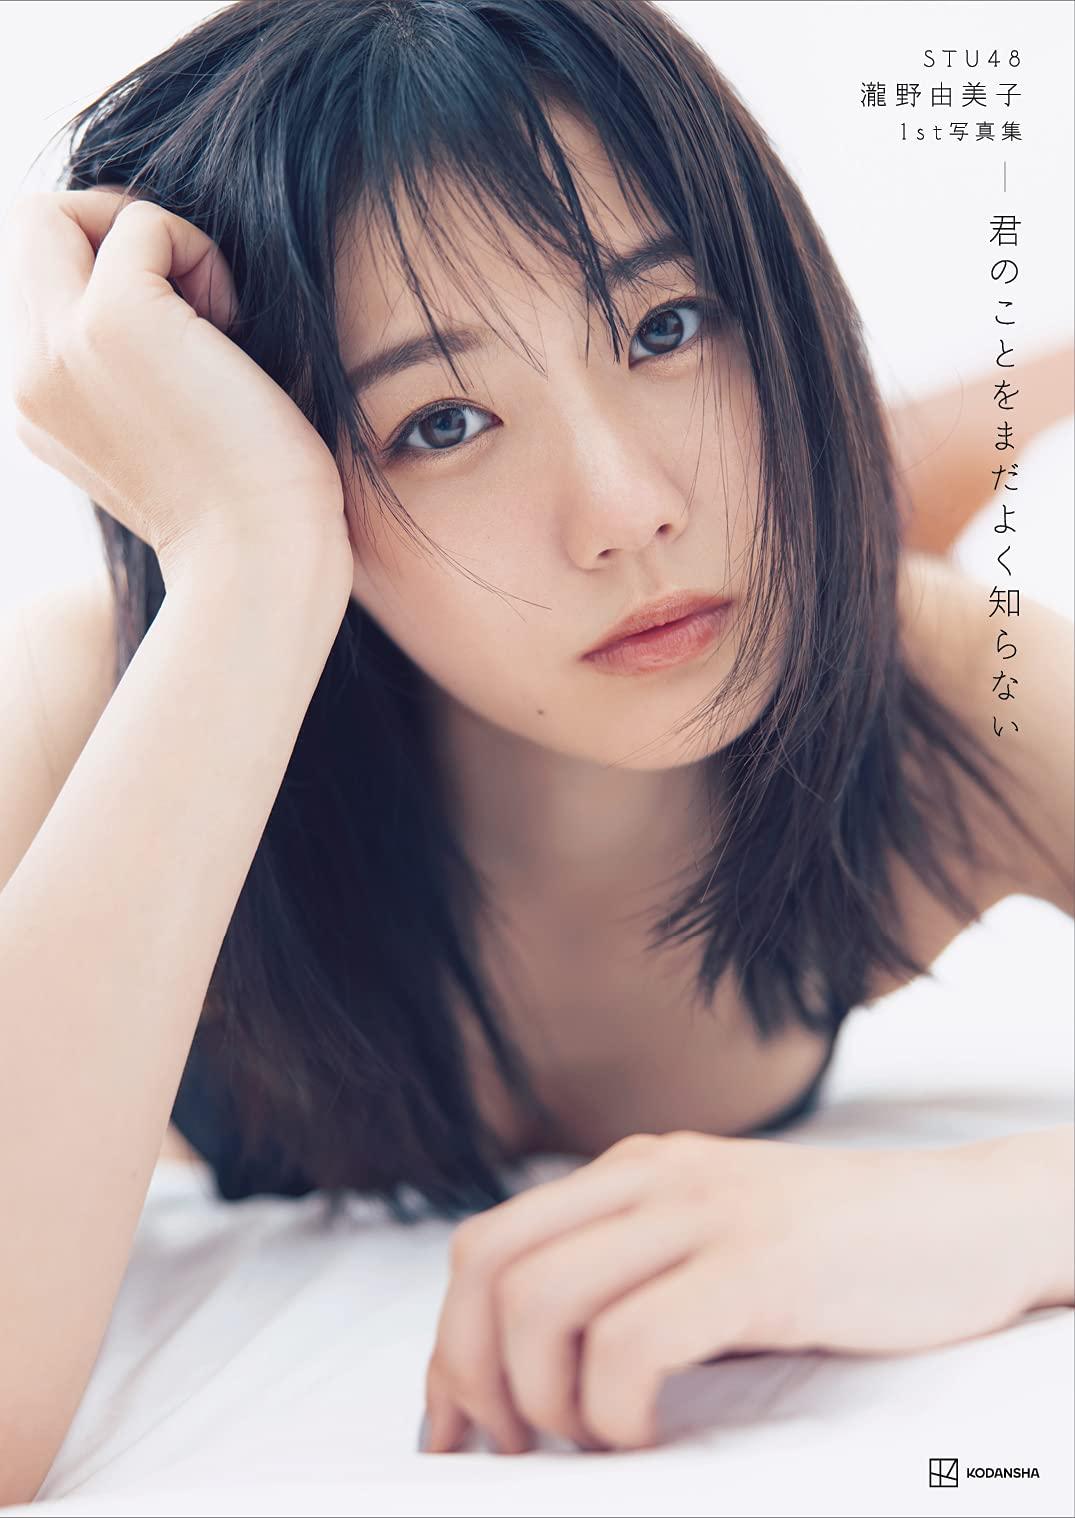 【Amazon.co.jp 限定】STU48 瀧野由美子1st写真集 『君のことをまだよく知らない』